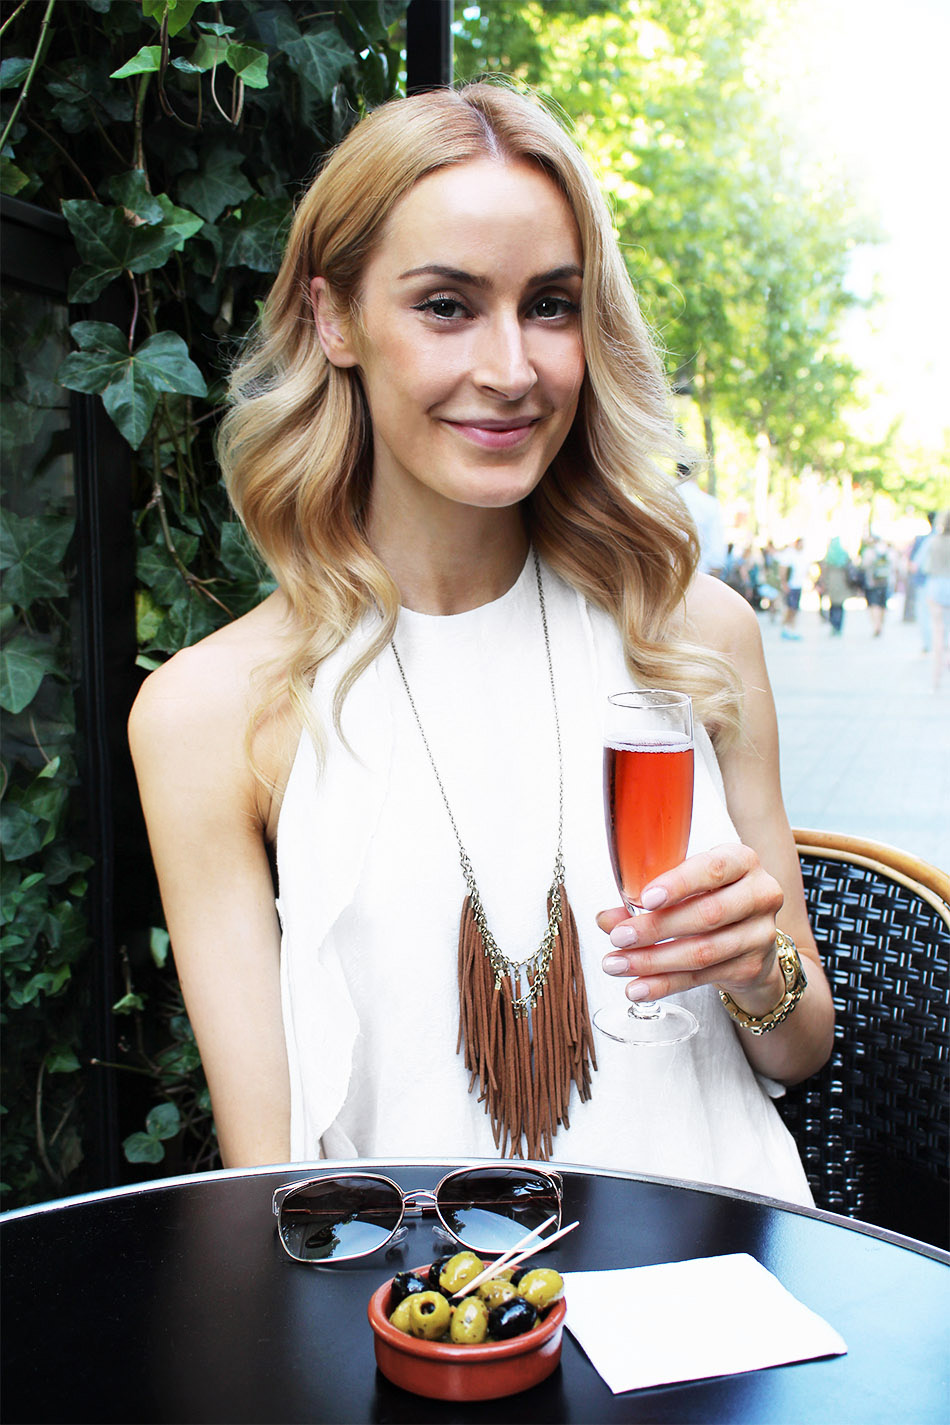 Having Drinks on Champs-Élysées - Pic 4, 3